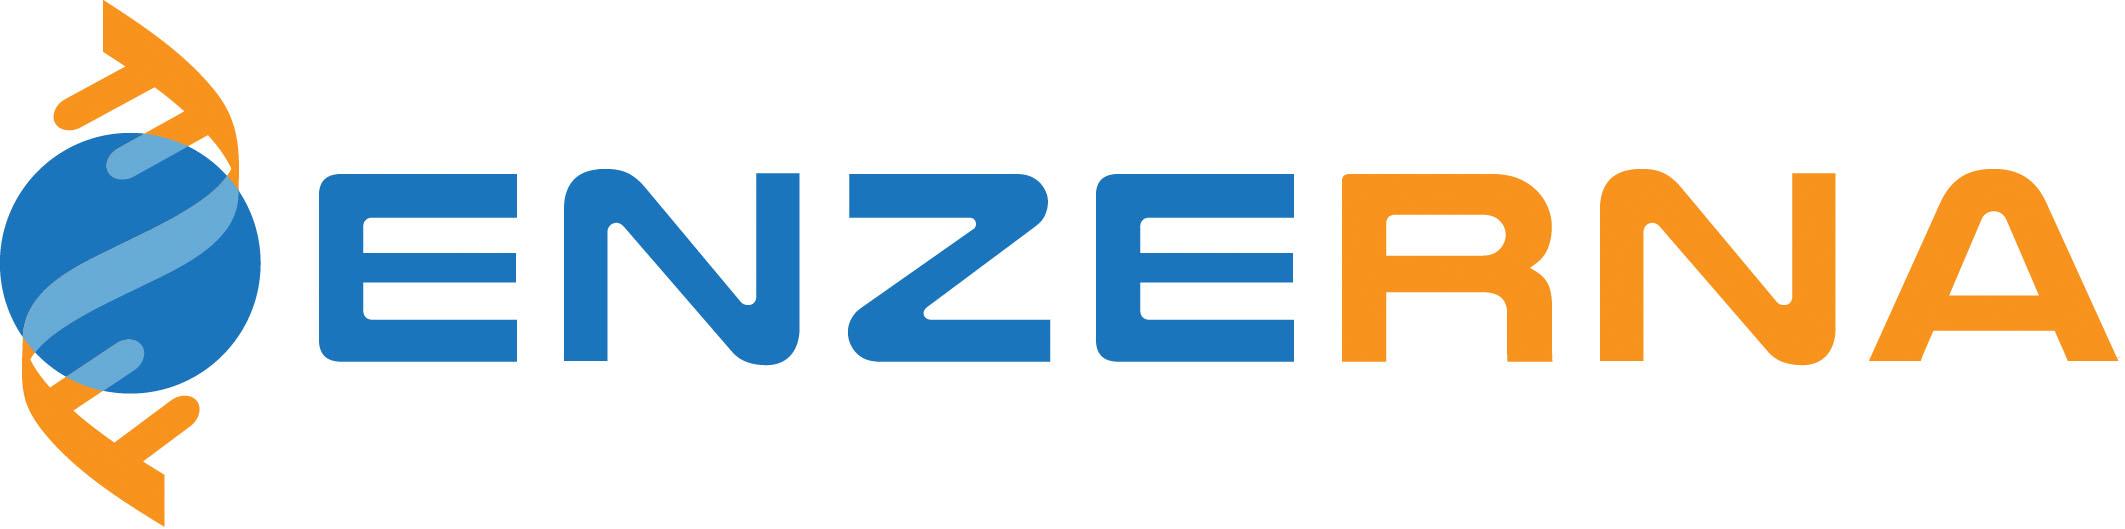 Enzerna_logo_final.jpg